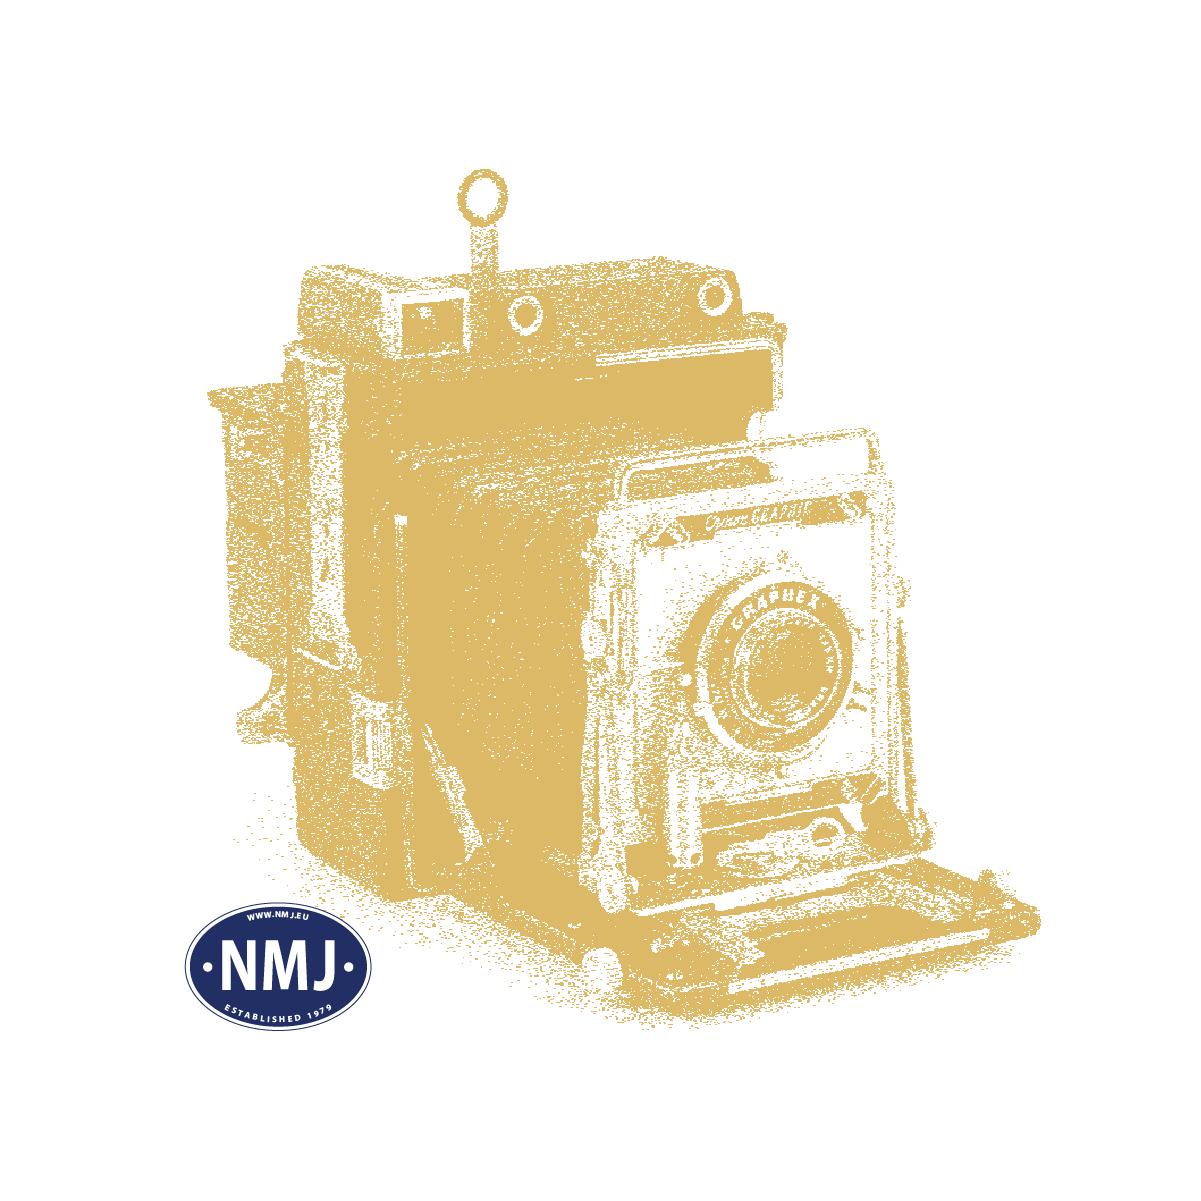 NMJ0G4-4 - NMJ Superline NSB Gbkls 20 76 158 5889-0, Spor 0